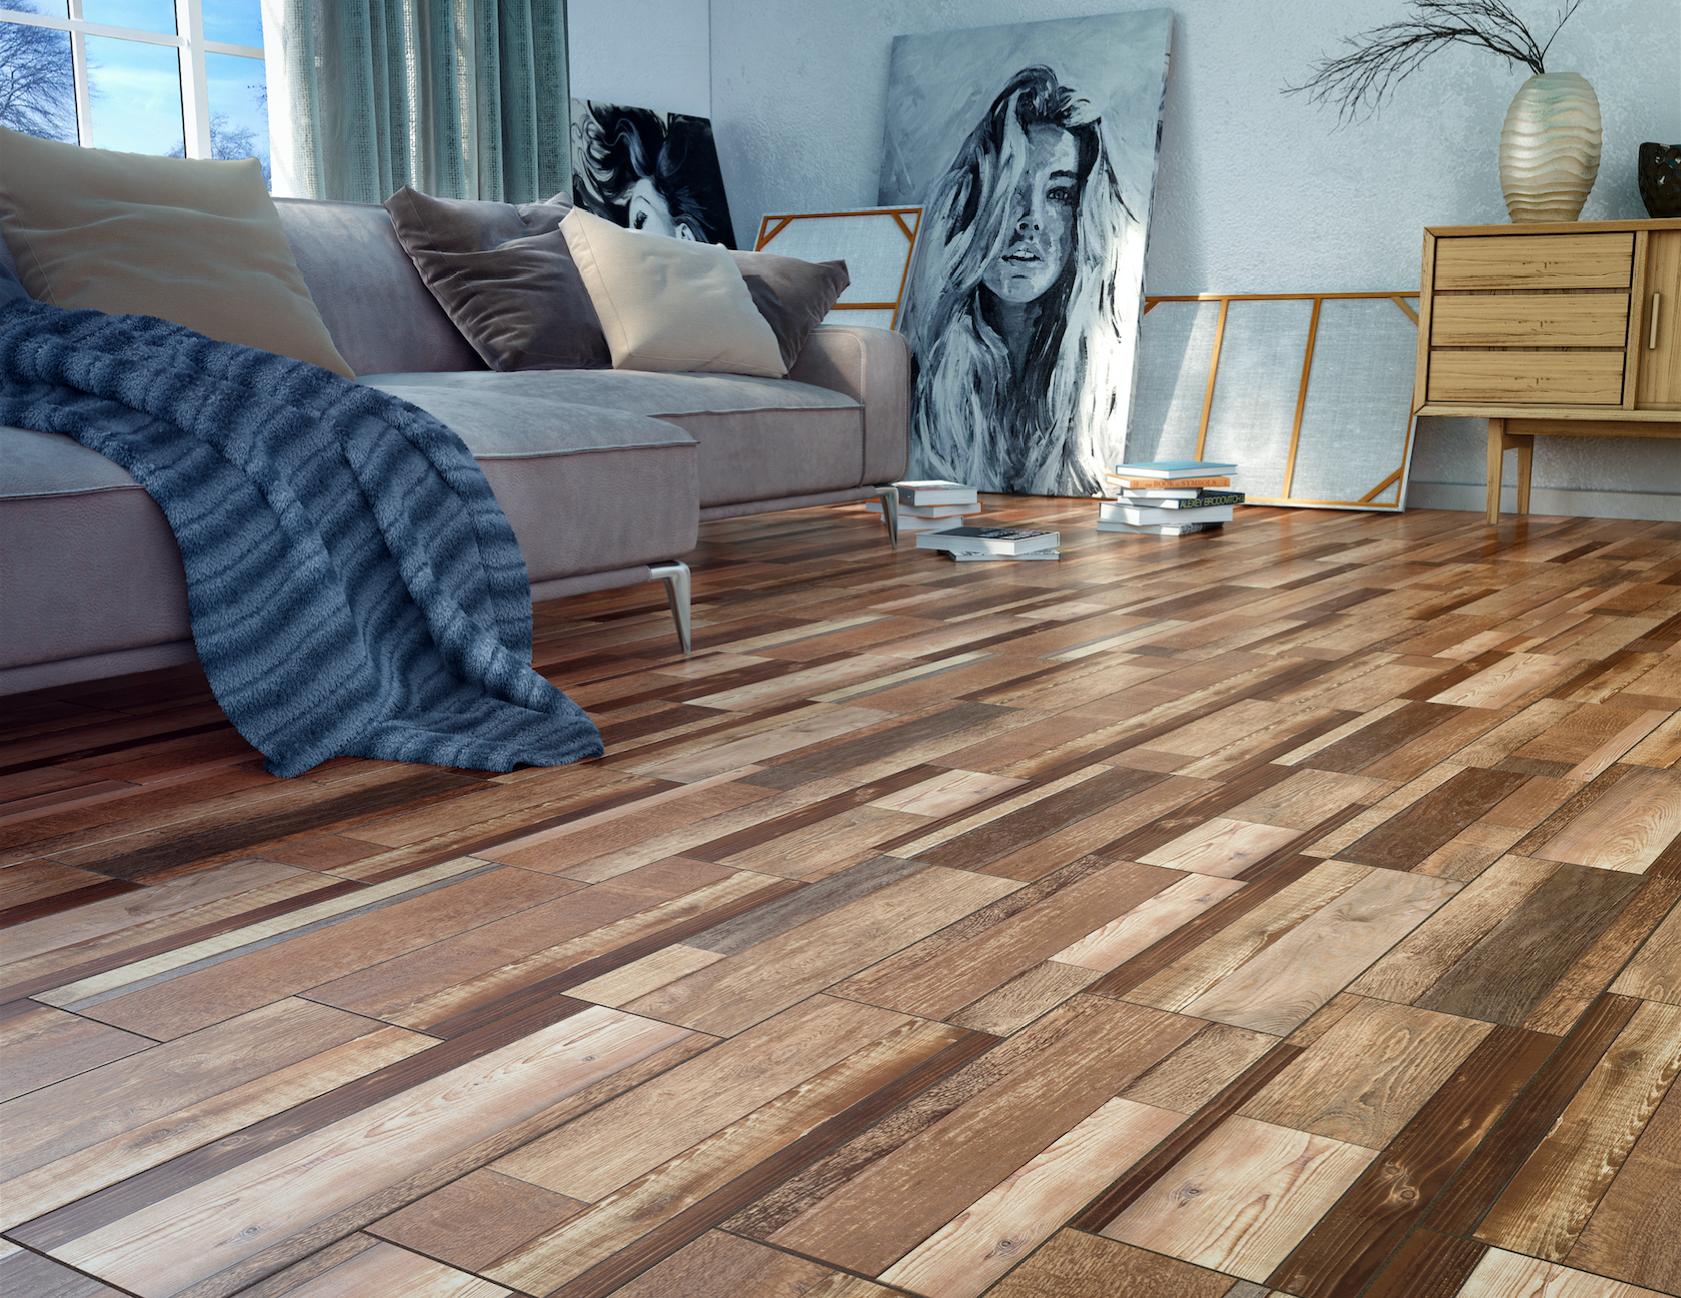 Piso legno 18x50 caf daltile ideas para house - Ceramico imitacion madera ...